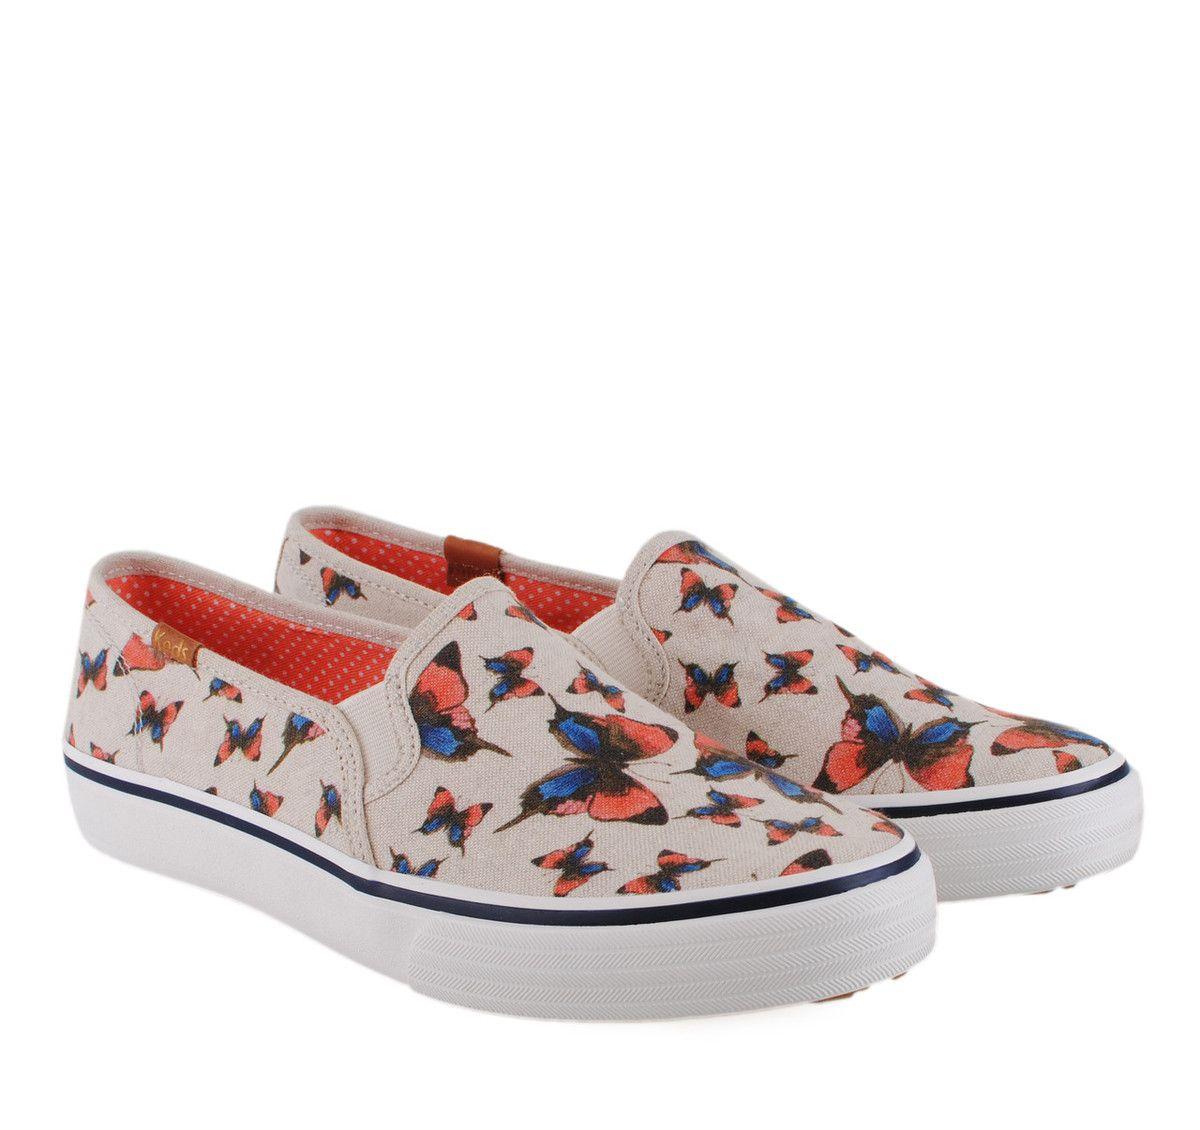 2e609ab2ec4 KEDS Νatural Beige Canvas Slippers. Γυναικεία μπεζ υφασμάτινα slip-on  παπούτσια.